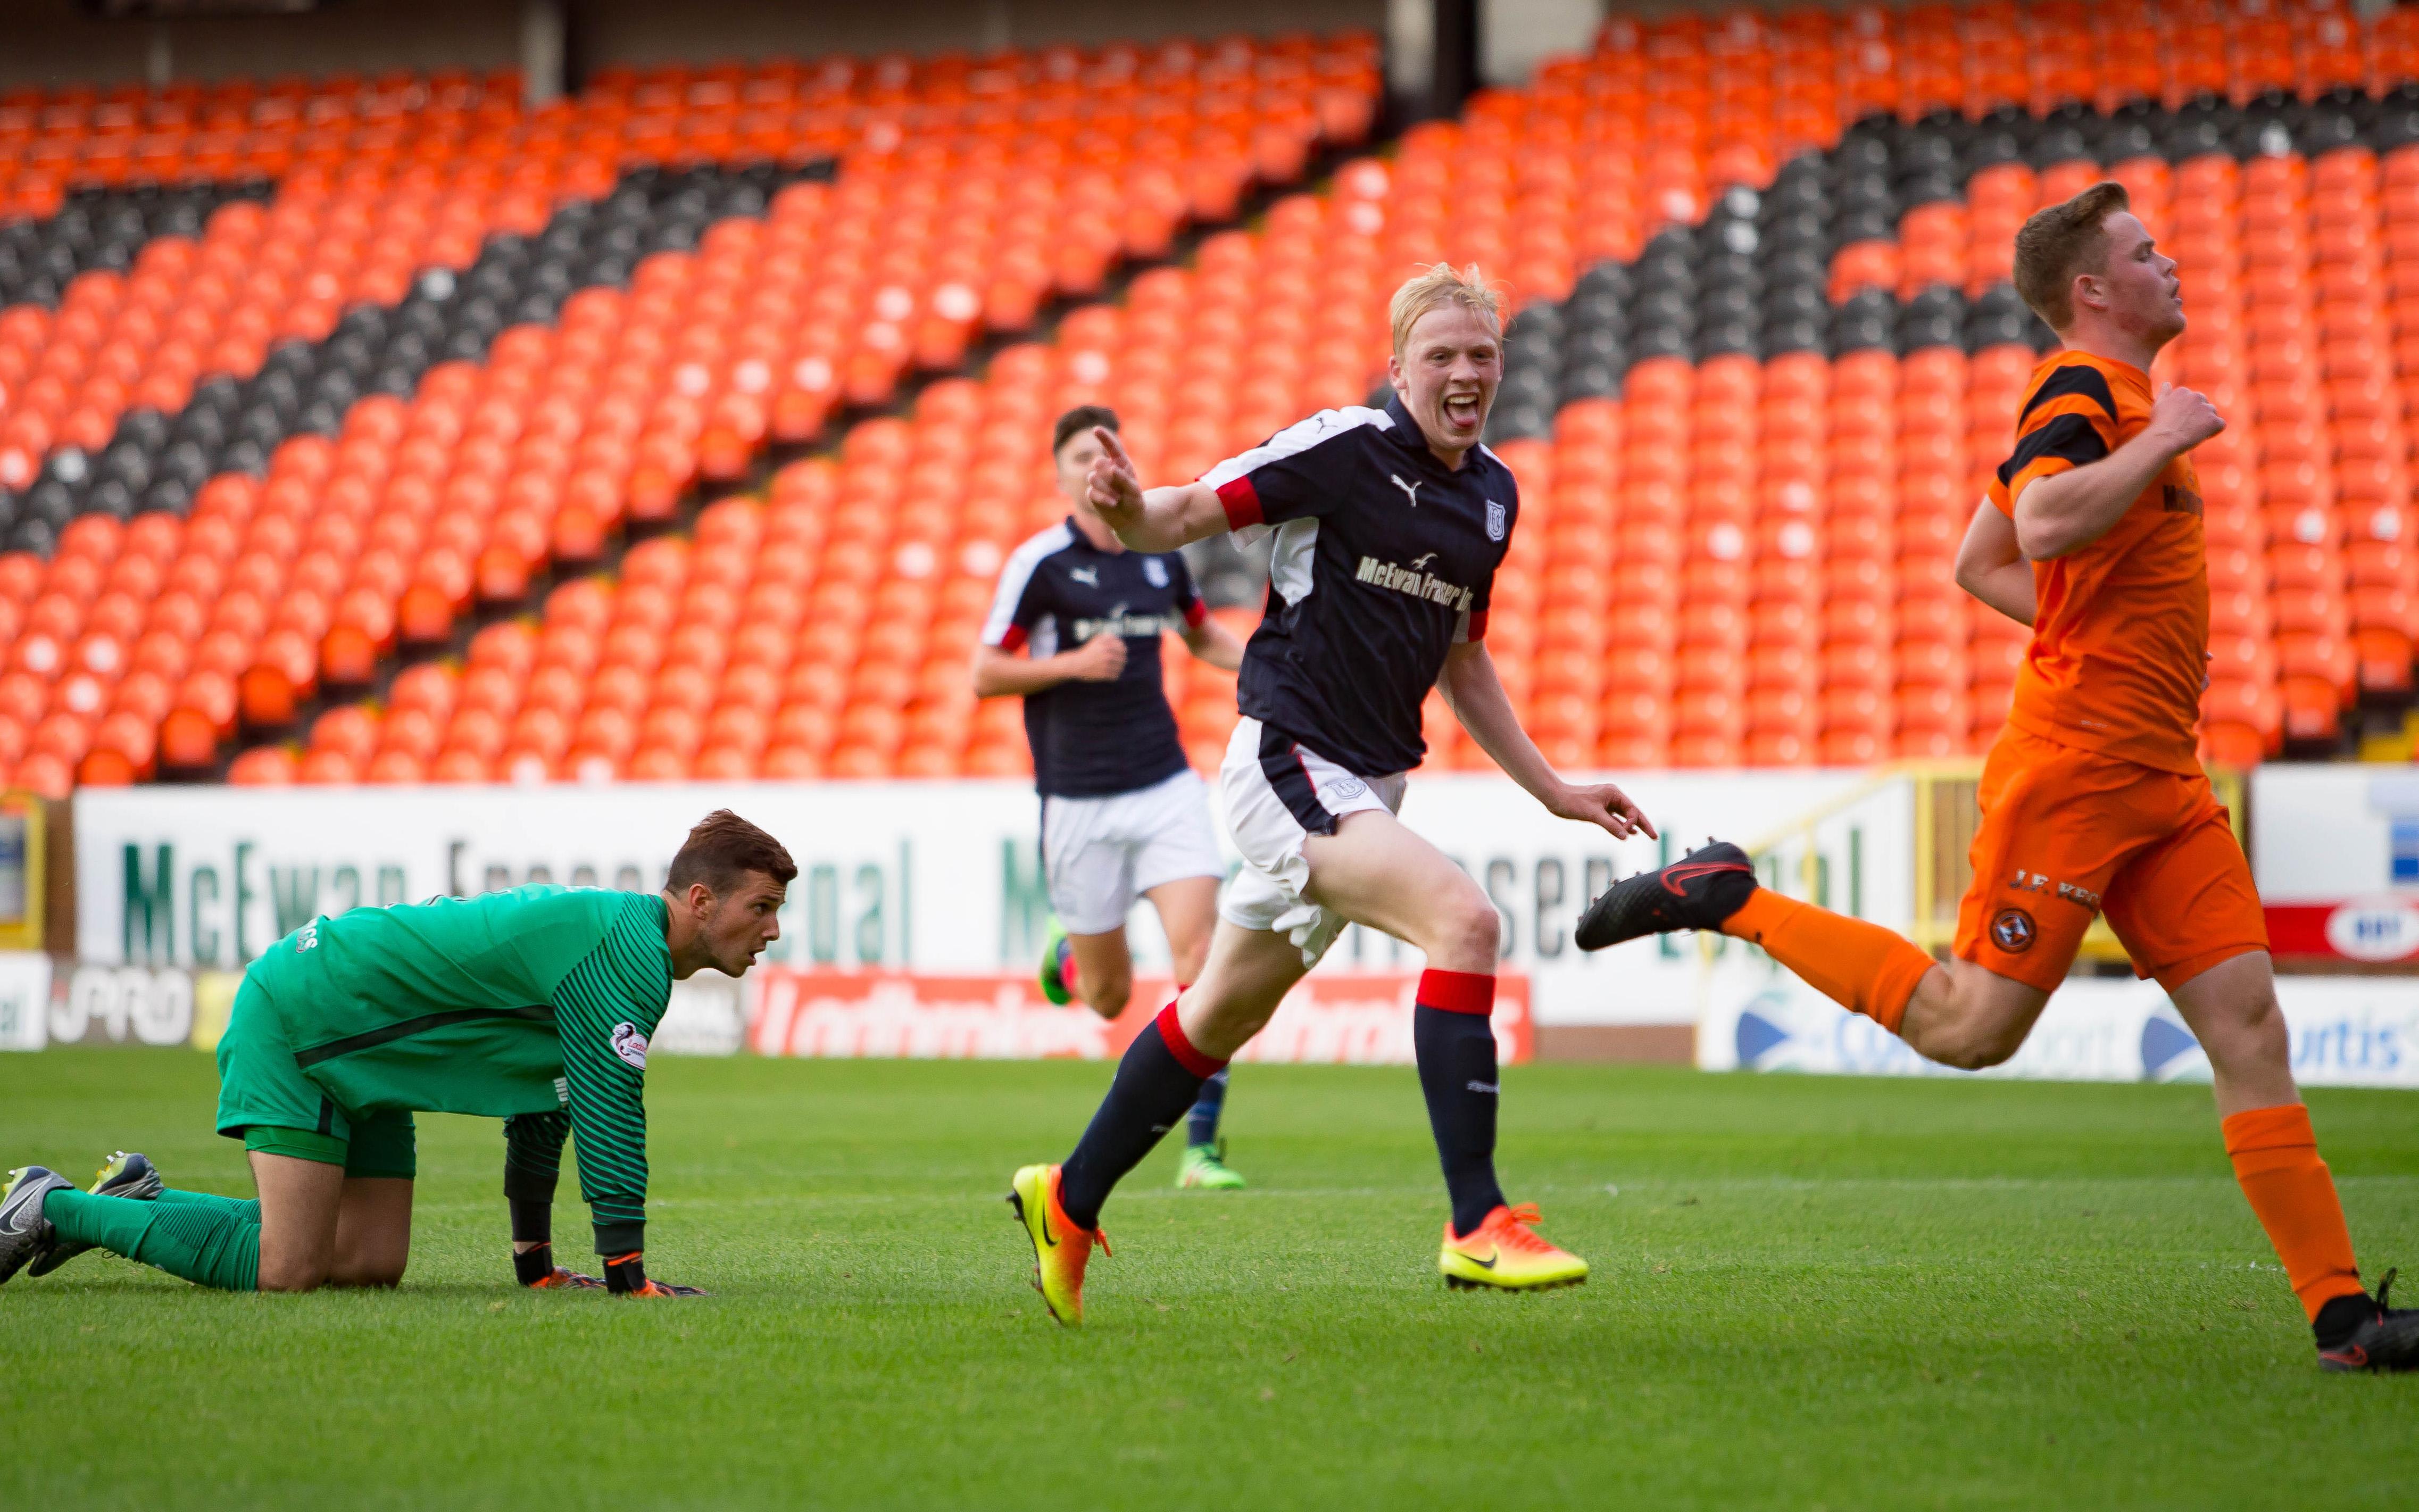 [Image: 06-09-2016-Dundee-United-v-Dundee-20s-0076.jpg]